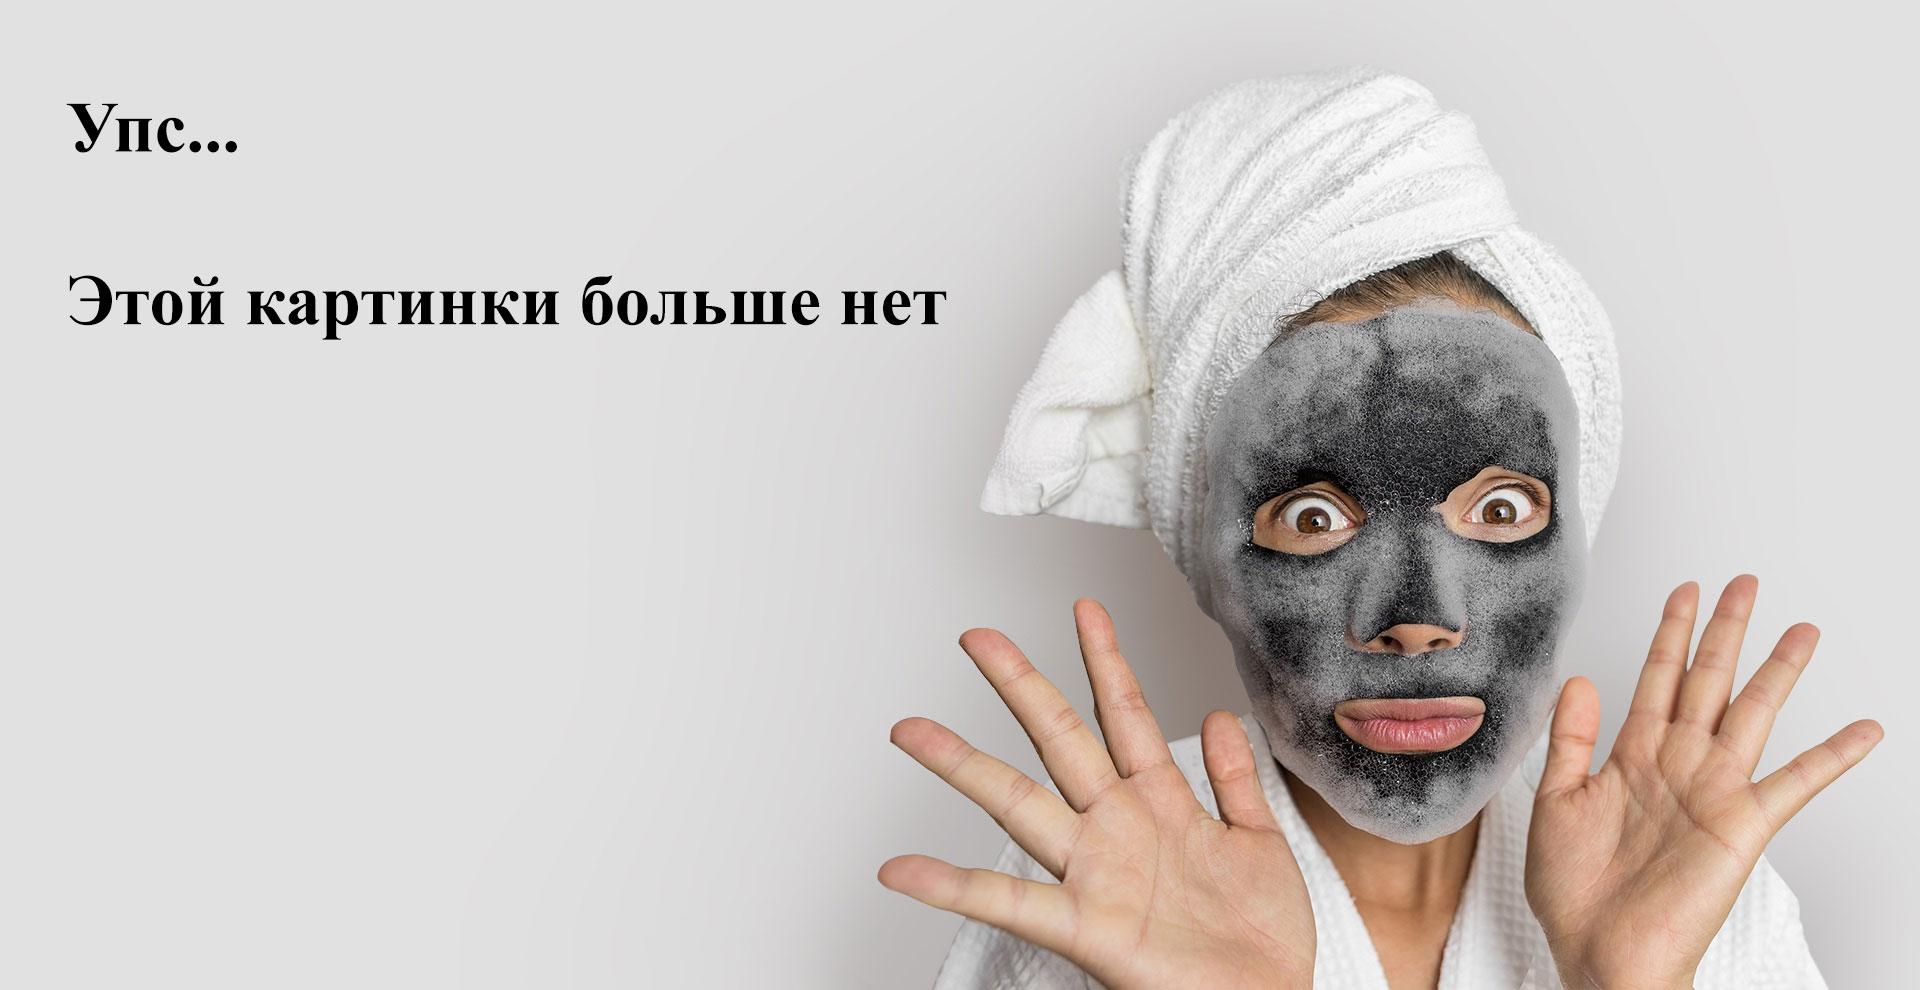 Vivienne Sabo, Туалетная вода Parfum Atelier, Cherie, 50 мл